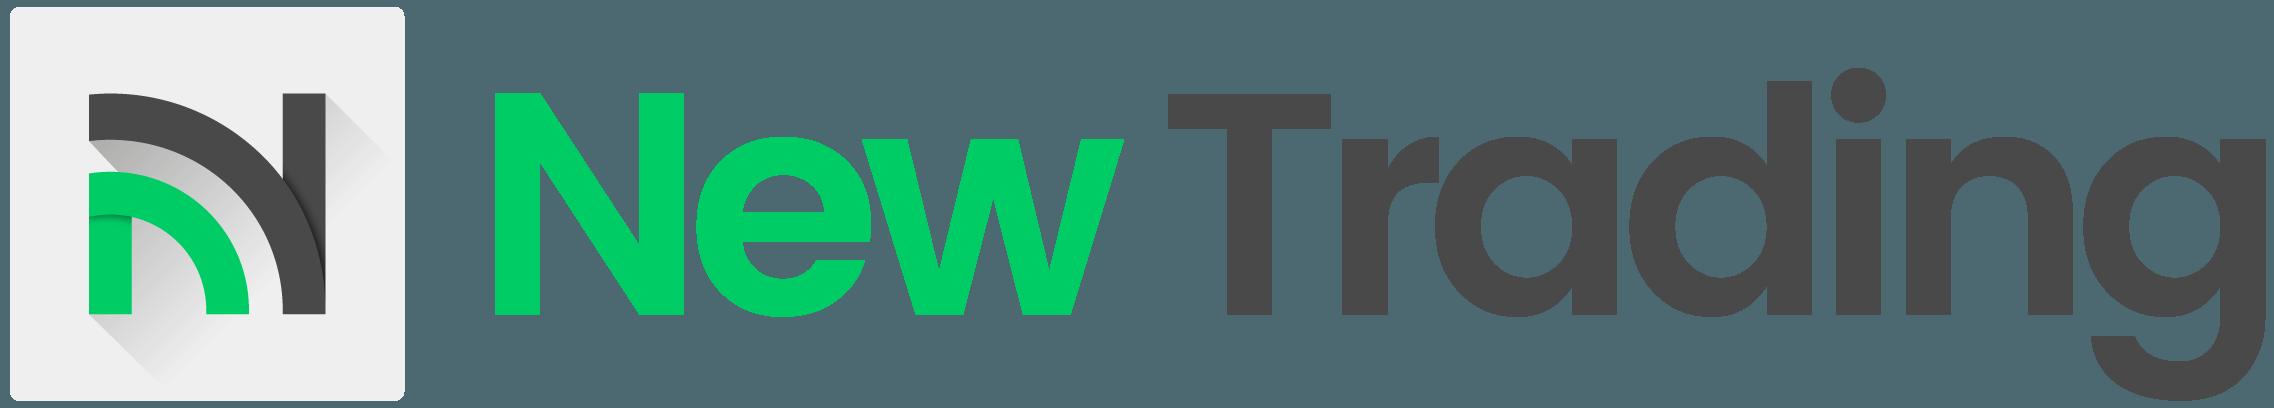 New Trading Logo